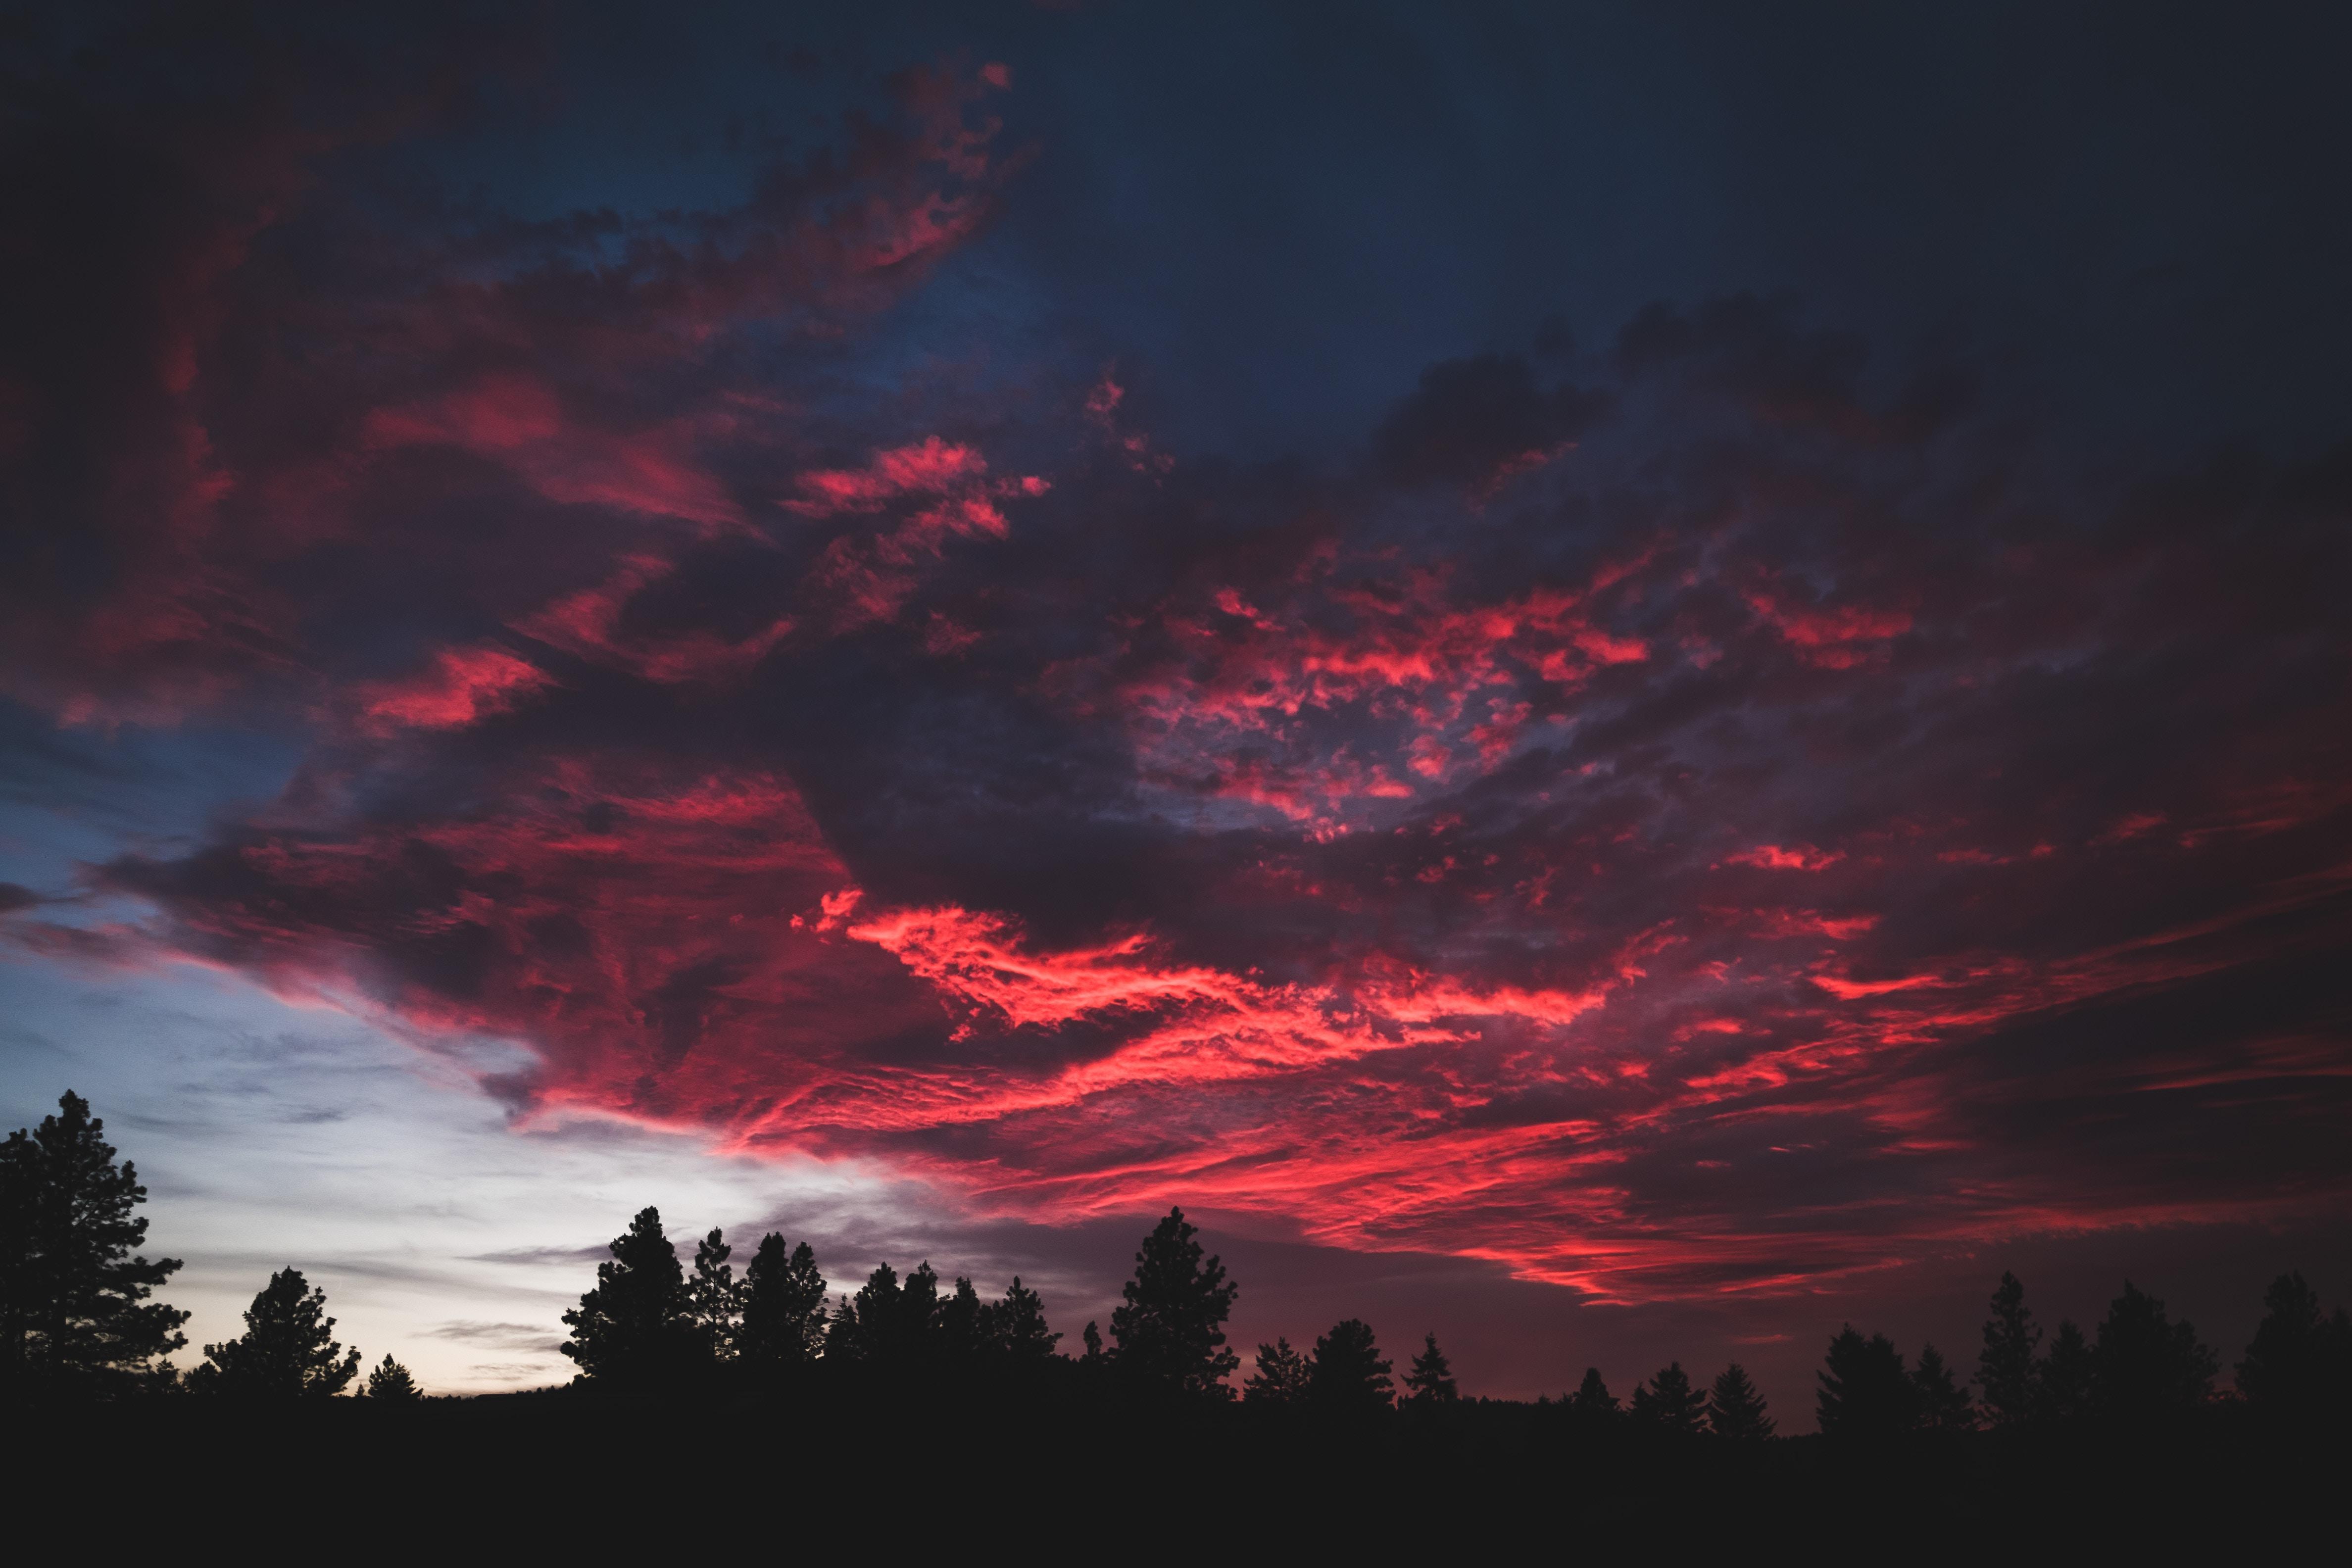 General 4752x3168 sky forest colorful sunset dark nature landscape